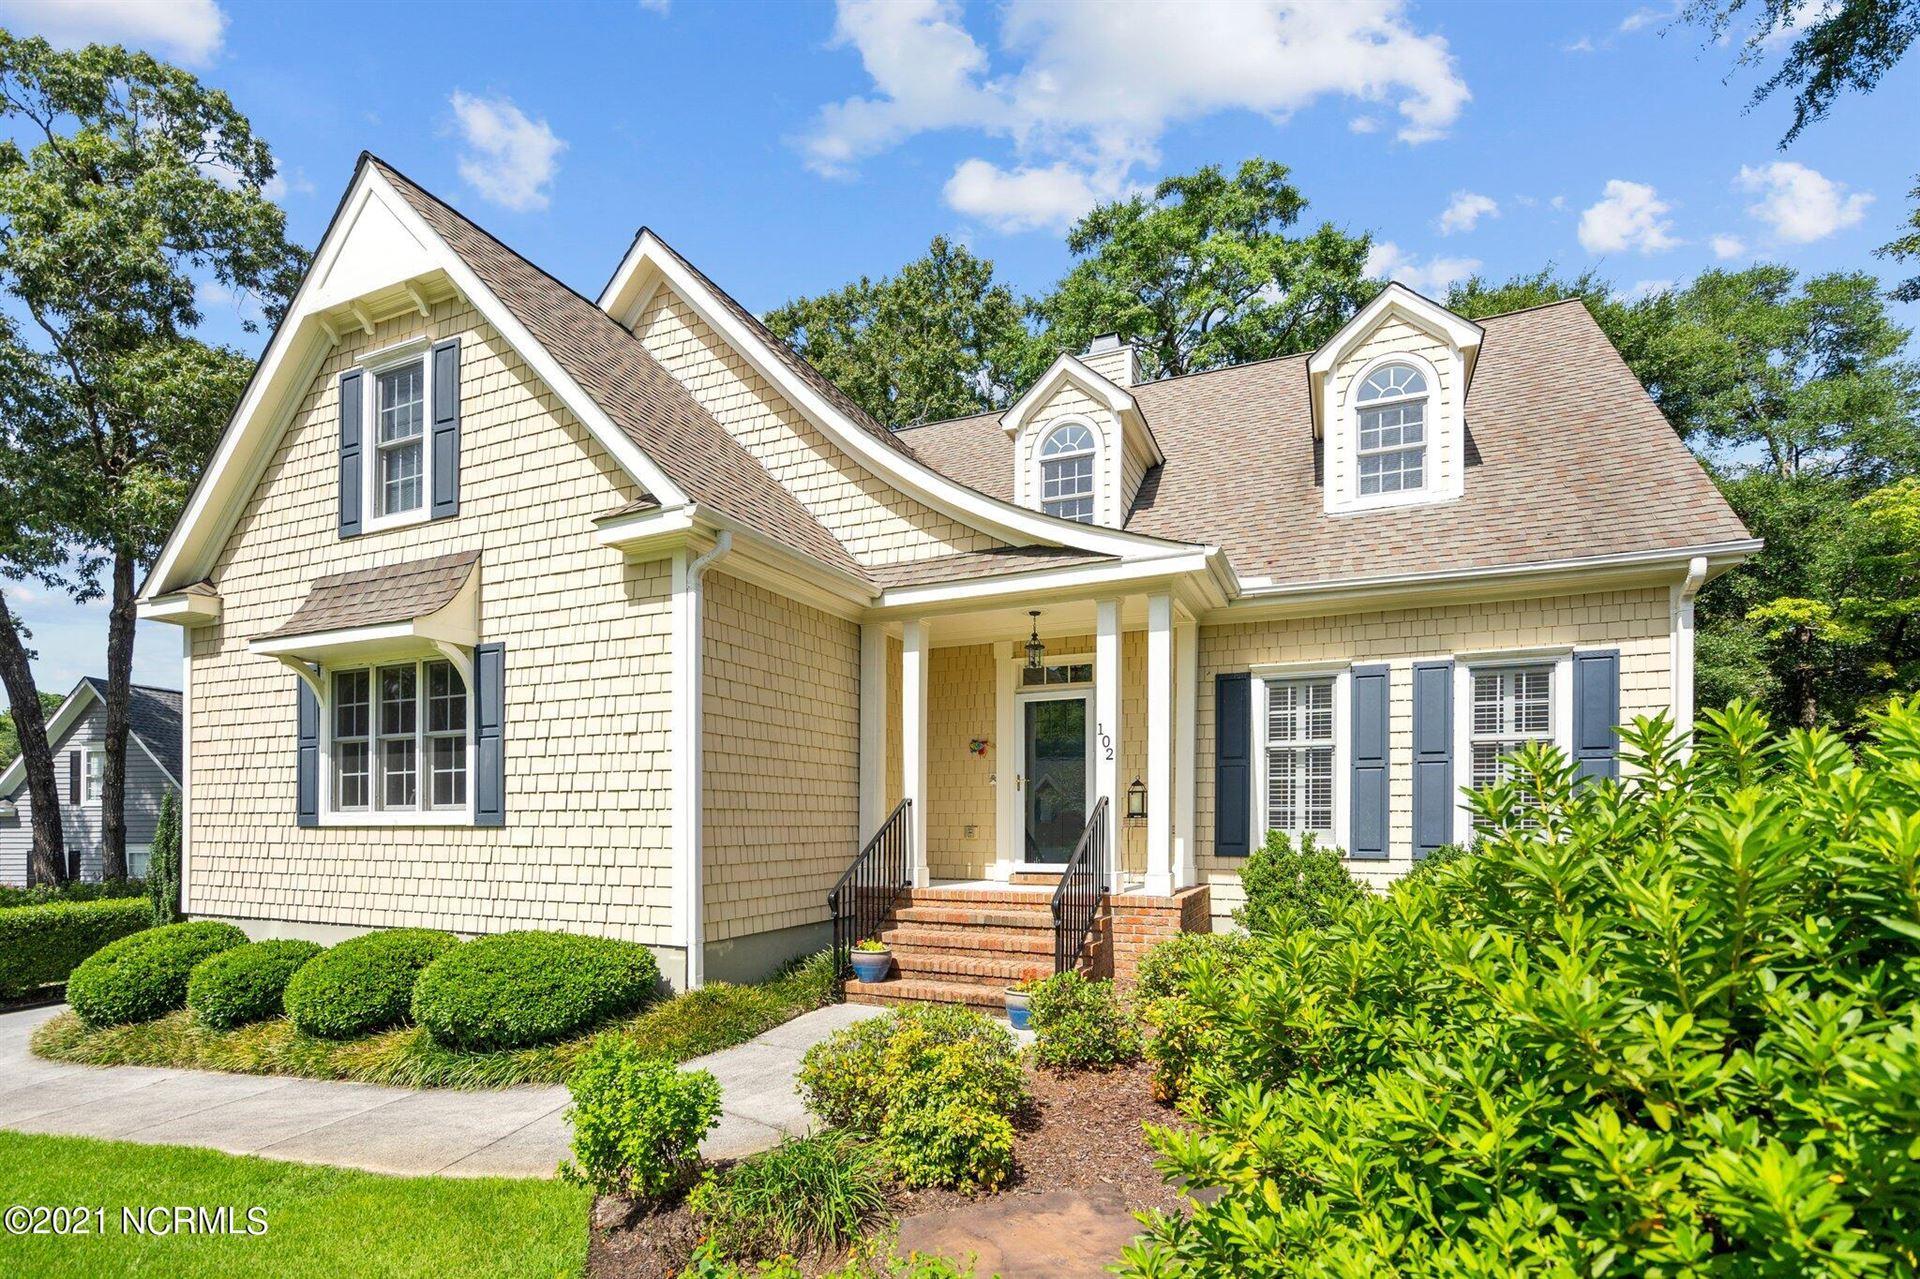 Photo of 102 Oxmoor Place, Wilmington, NC 28403 (MLS # 100289236)